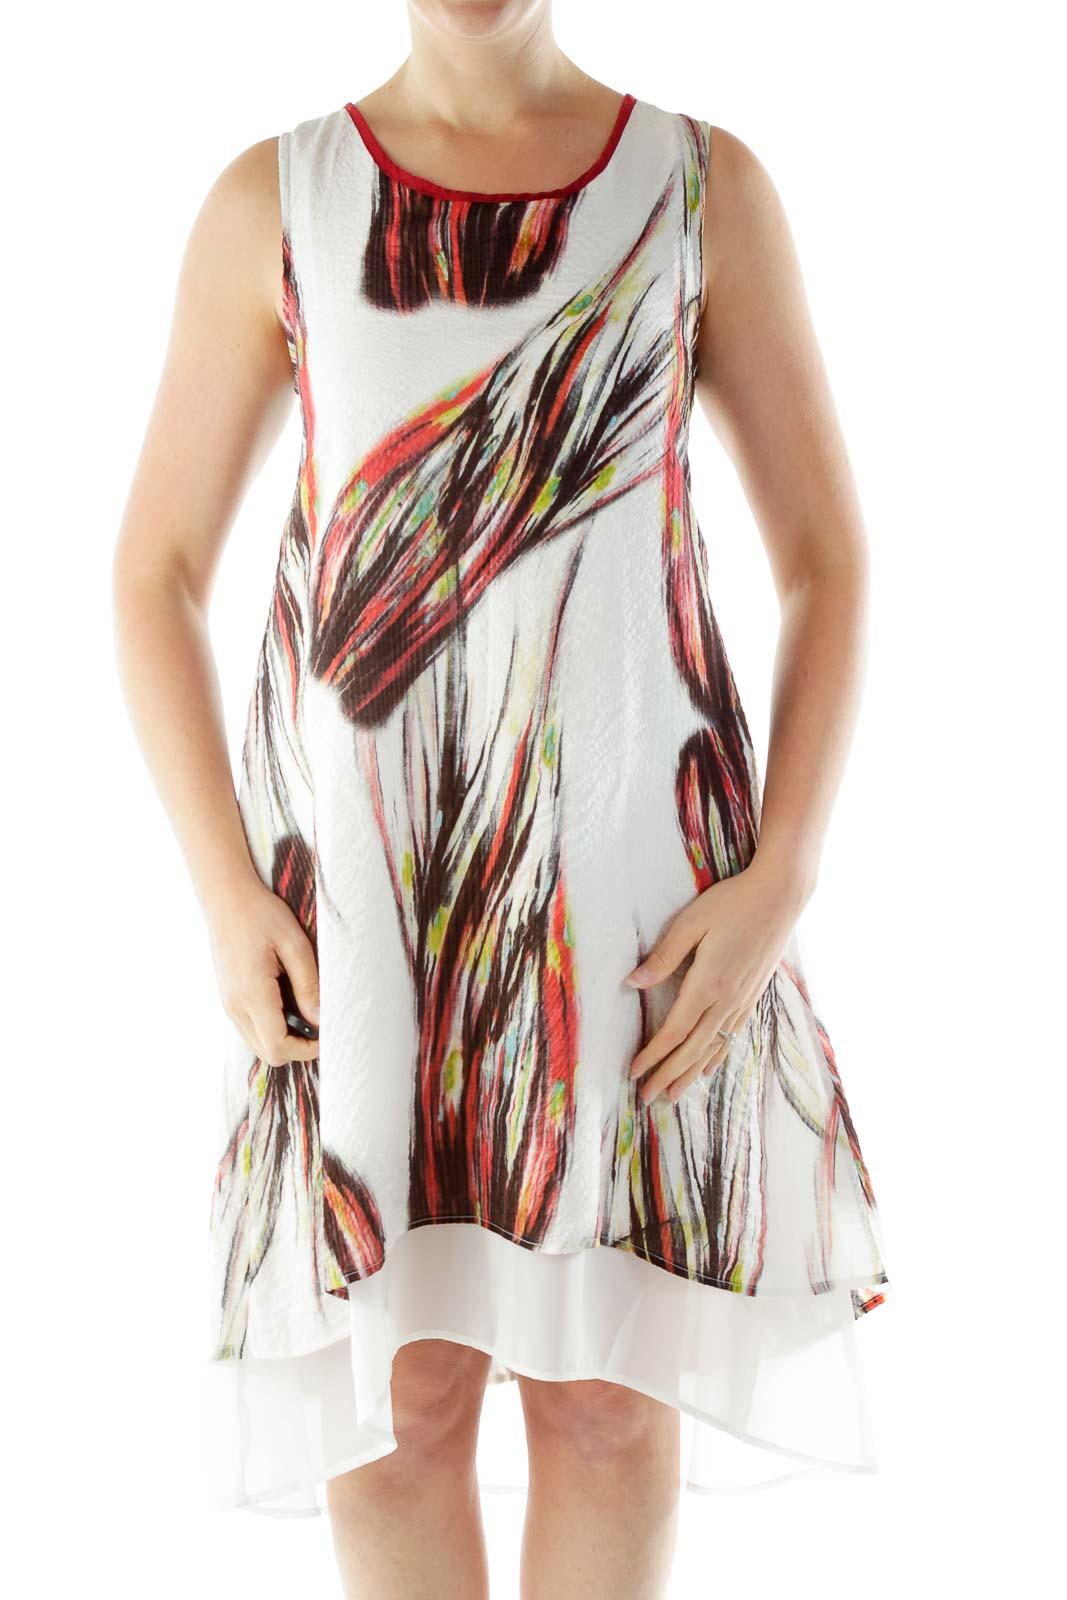 White Round Neck Sleeveless Dress Front